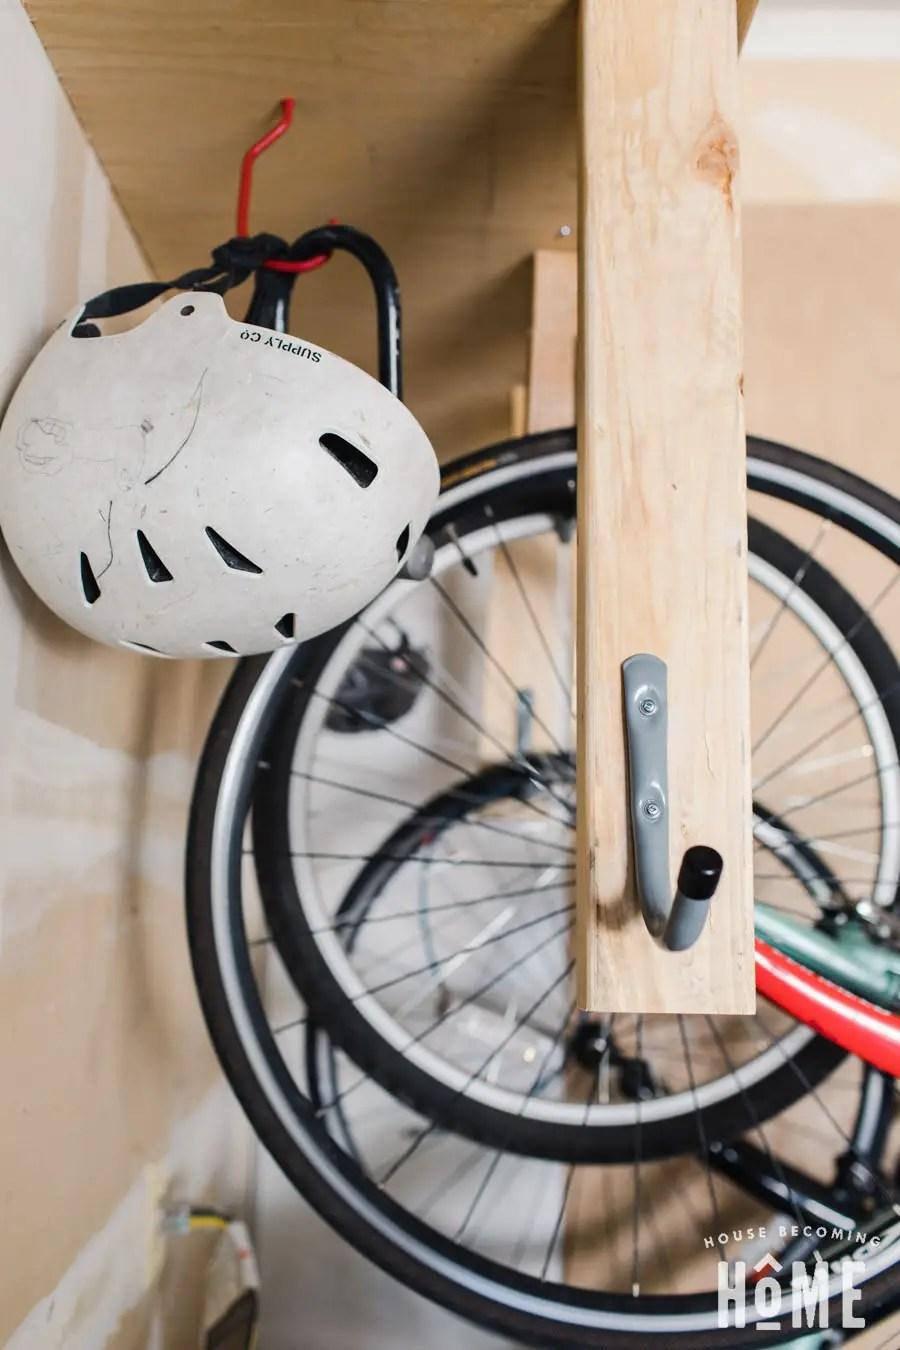 DIY Bike Rack Add a Hook for Helmets and Locks